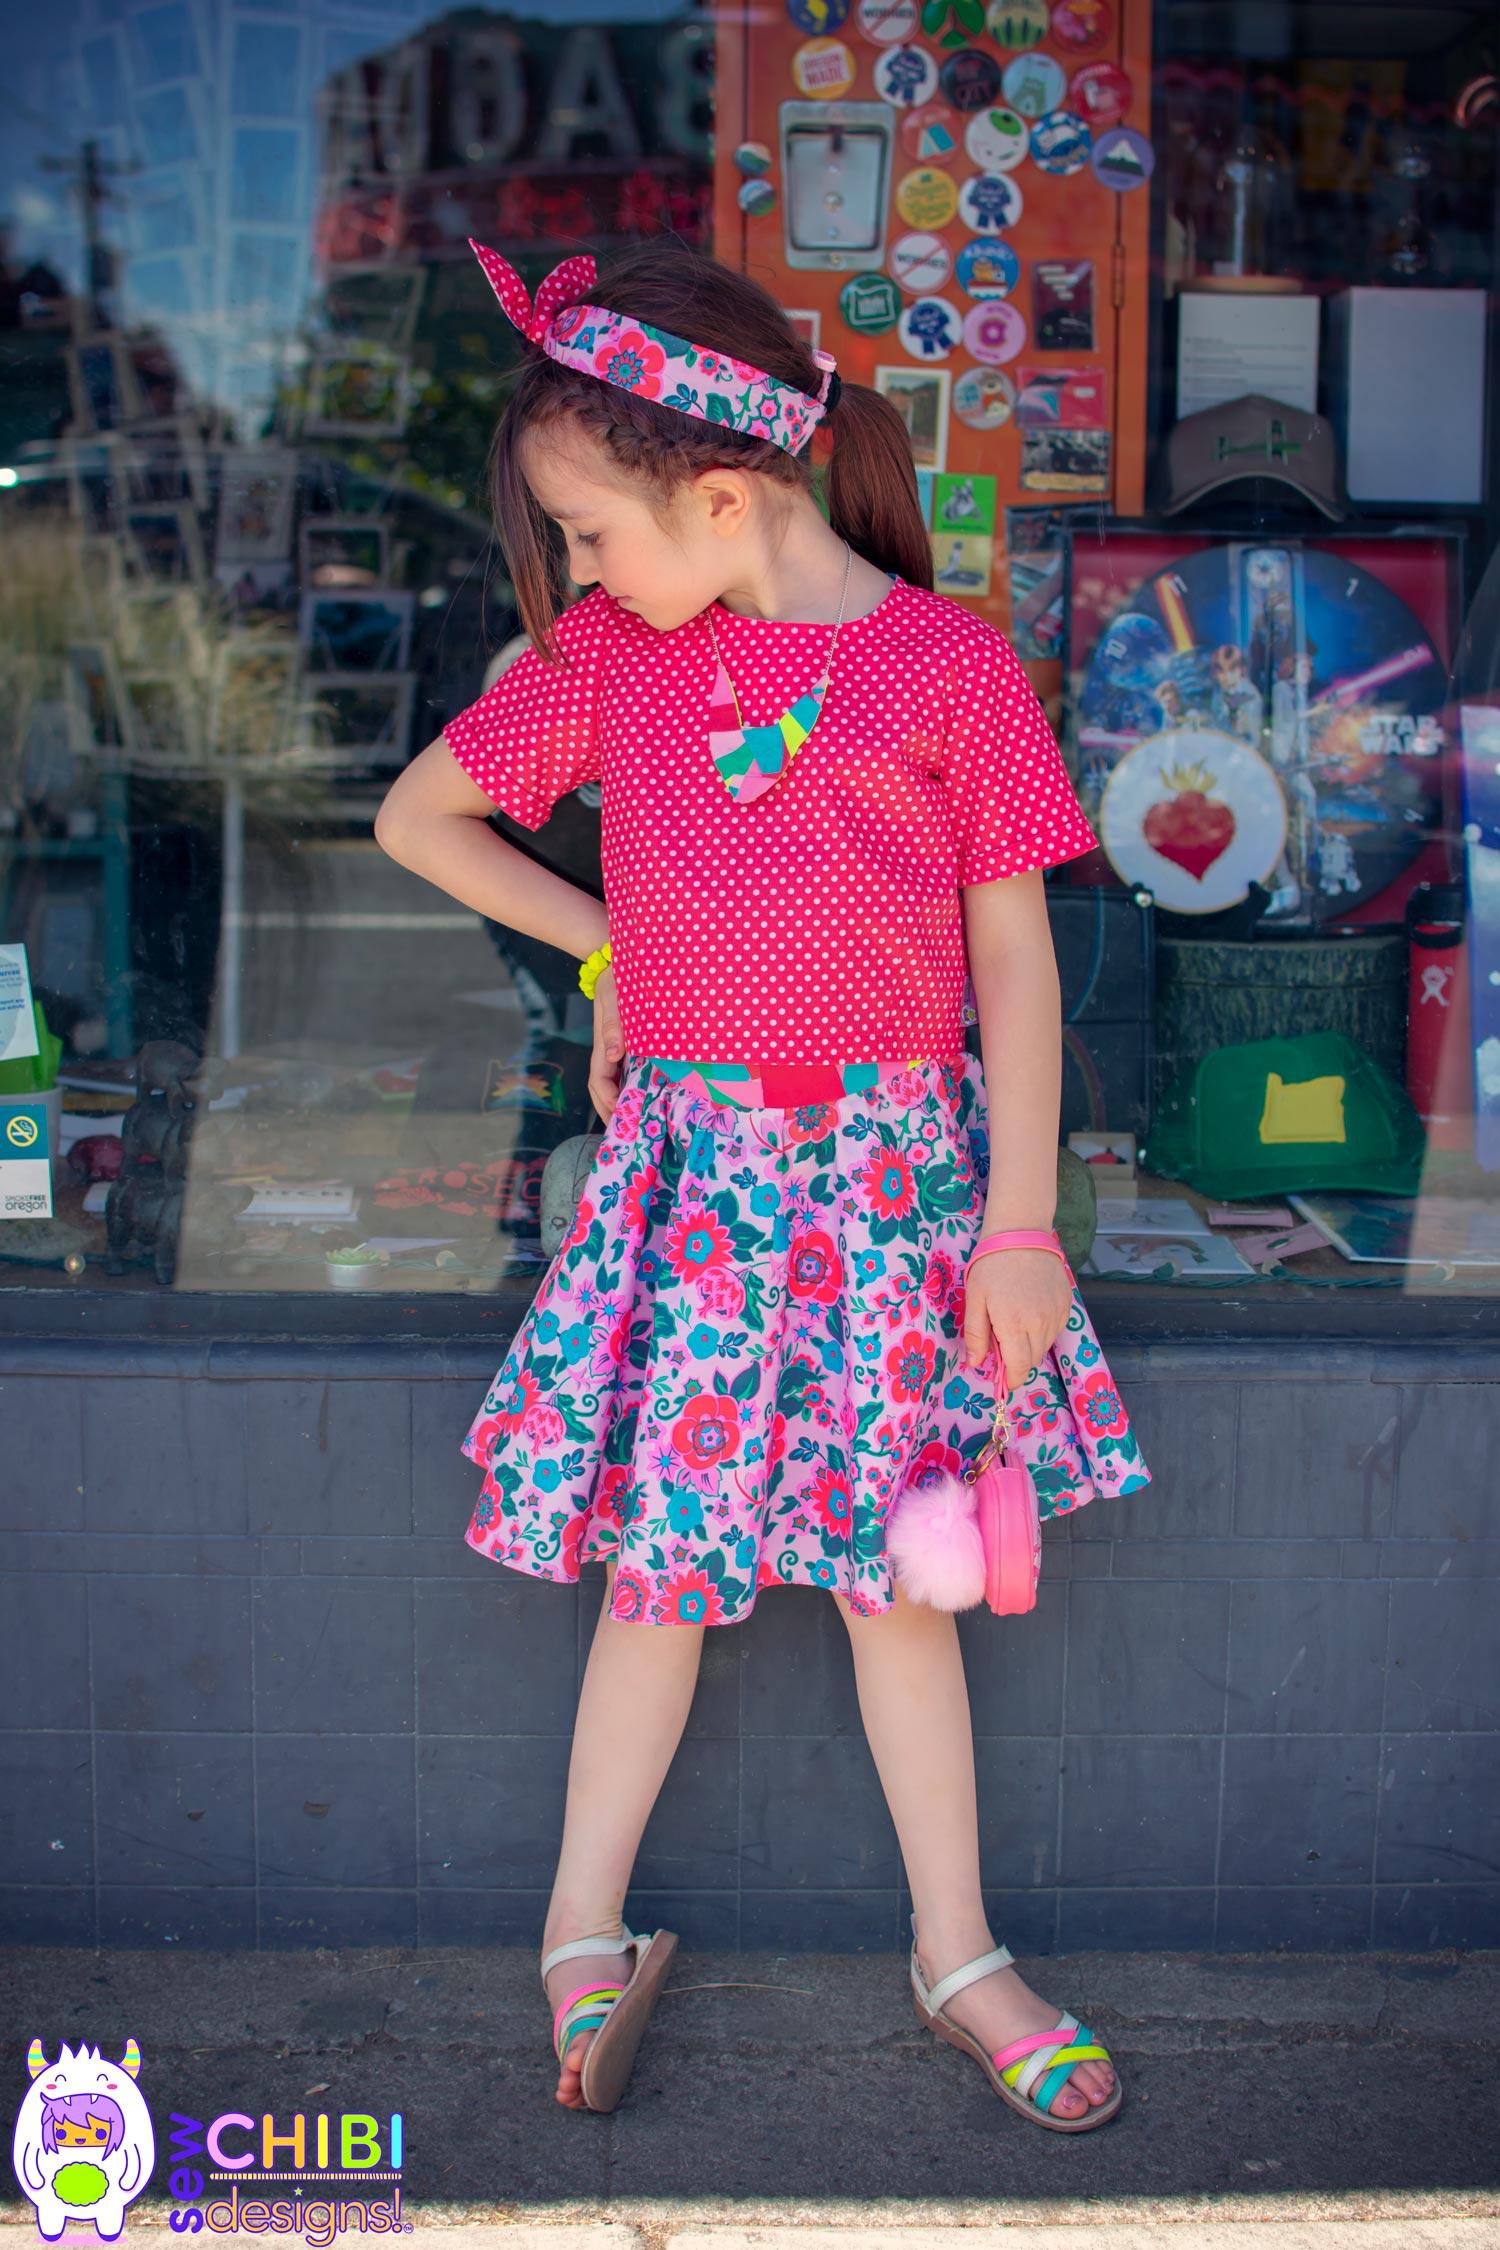 Sew-Chibi-Designs-Sew-Your-Stash-Ice-Cream-and-Sundays-18.jpg